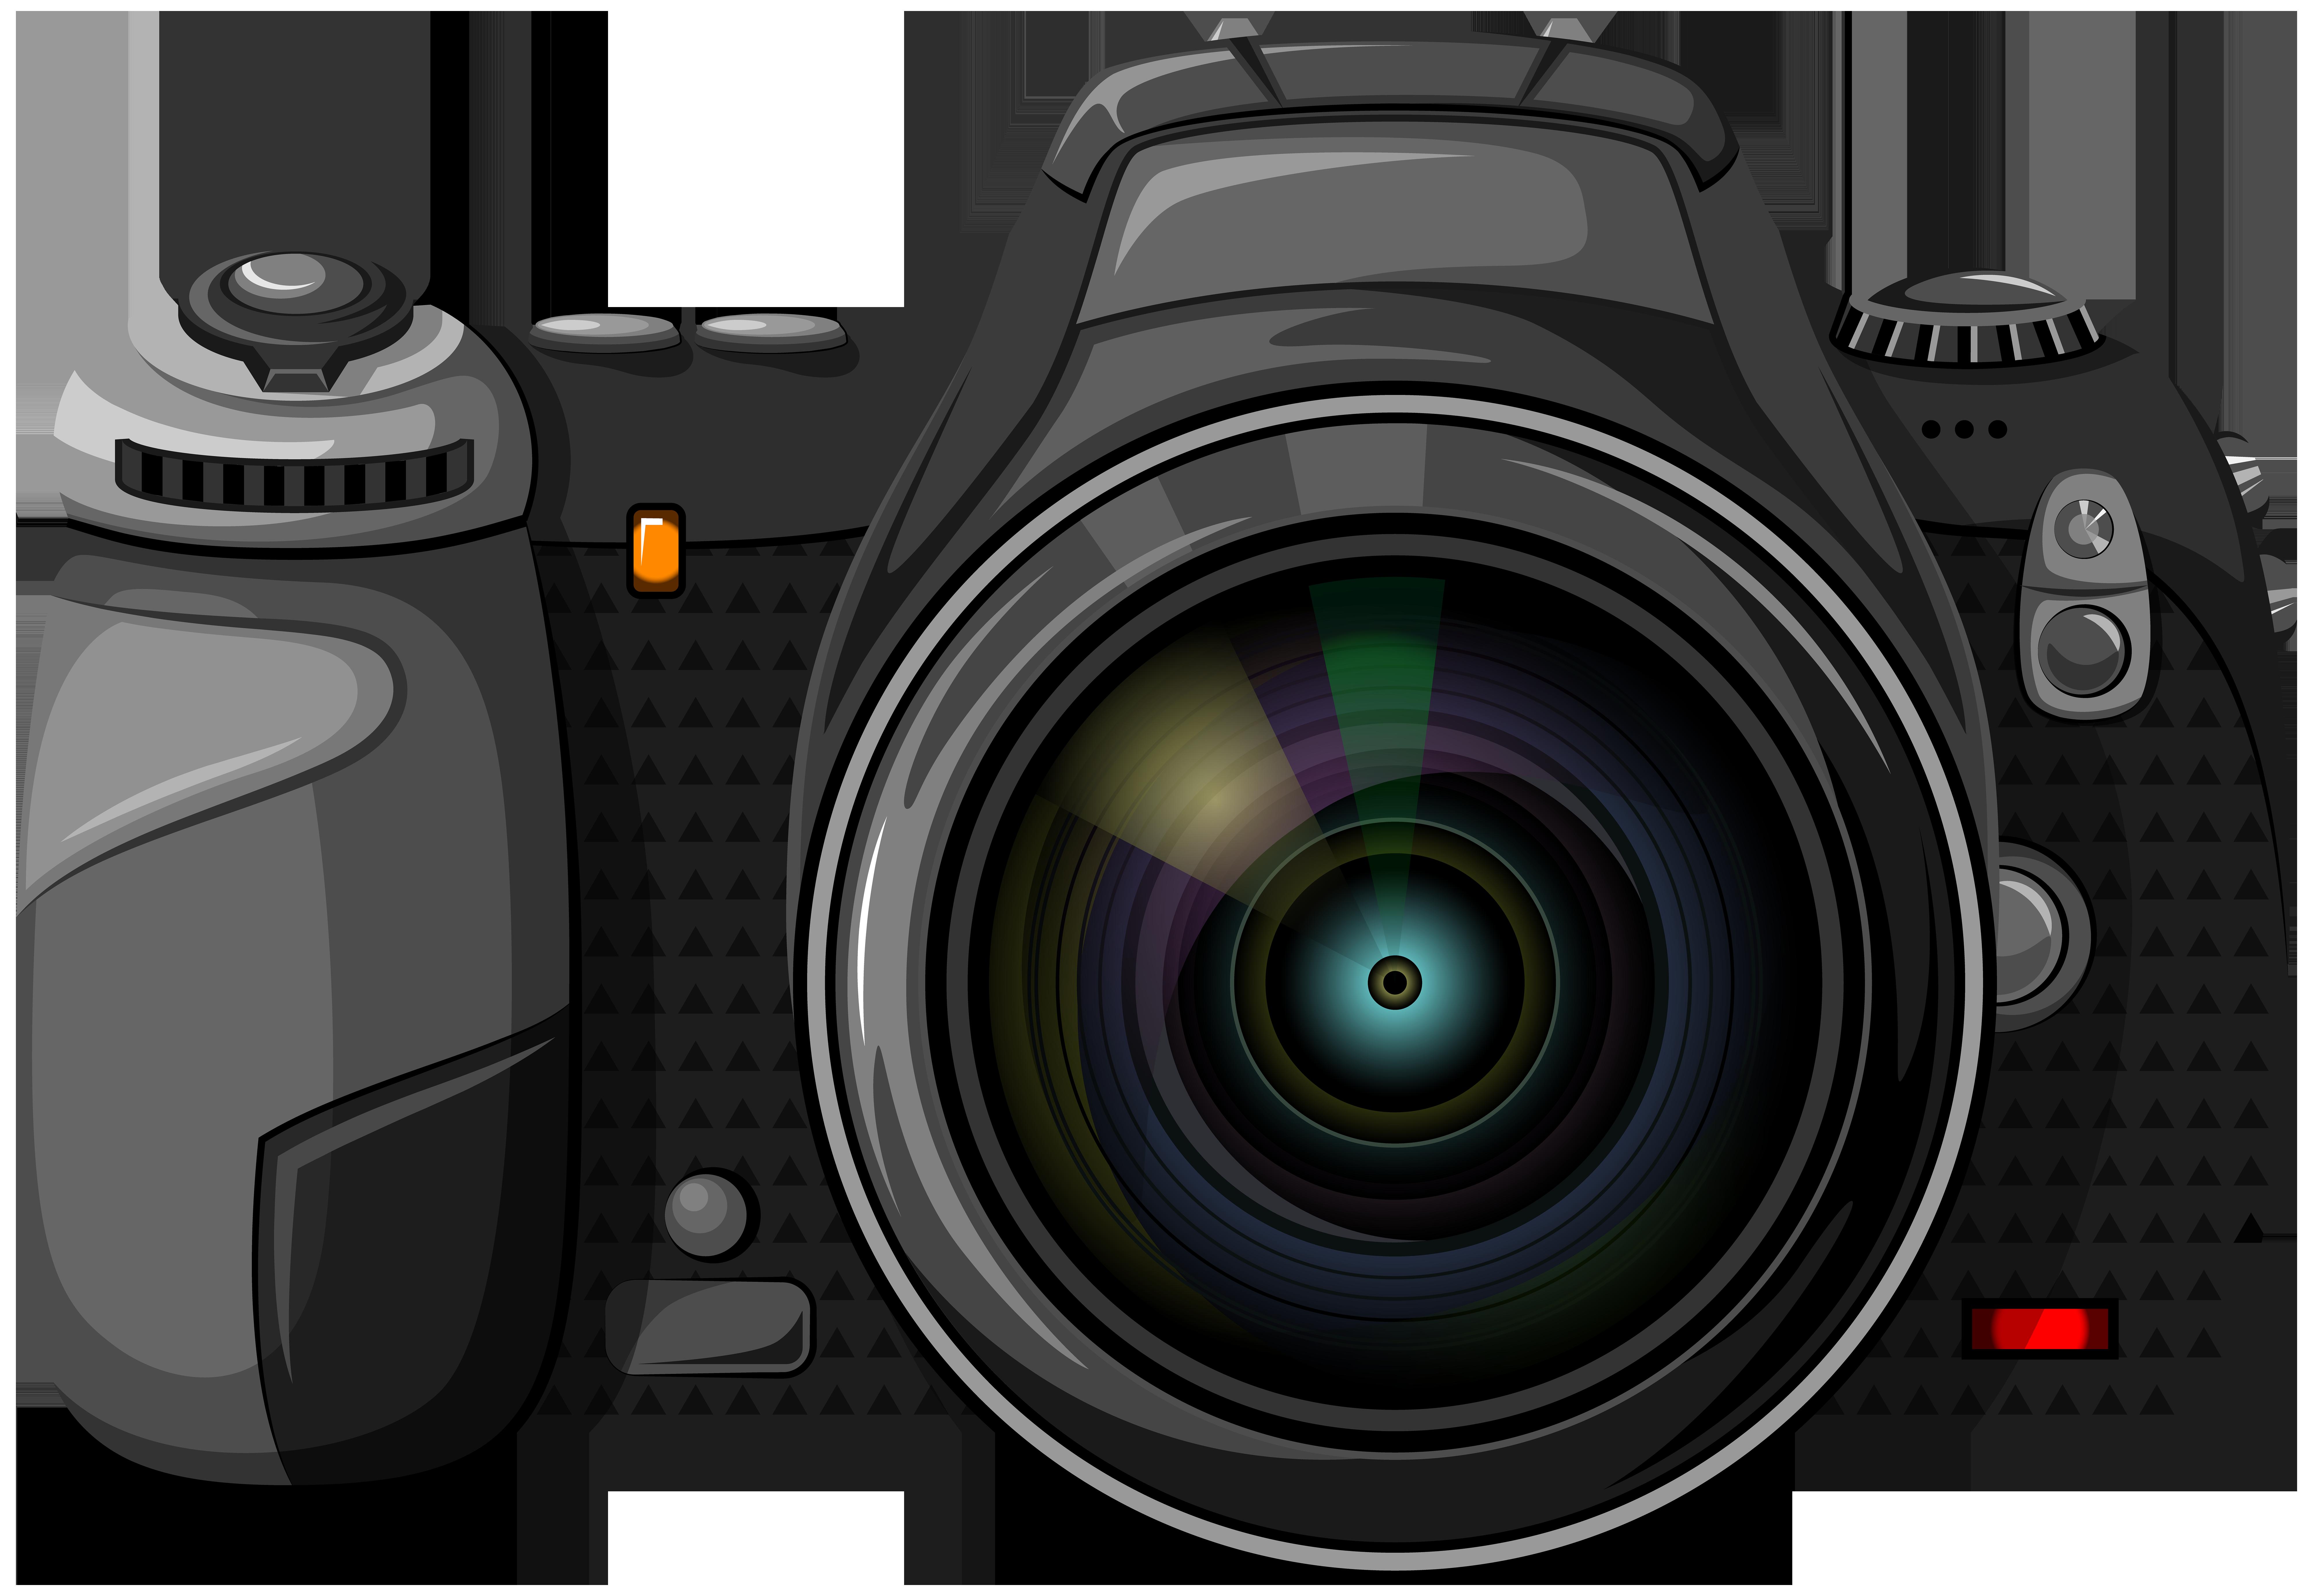 Png clip art image. Camera clipart transparent background